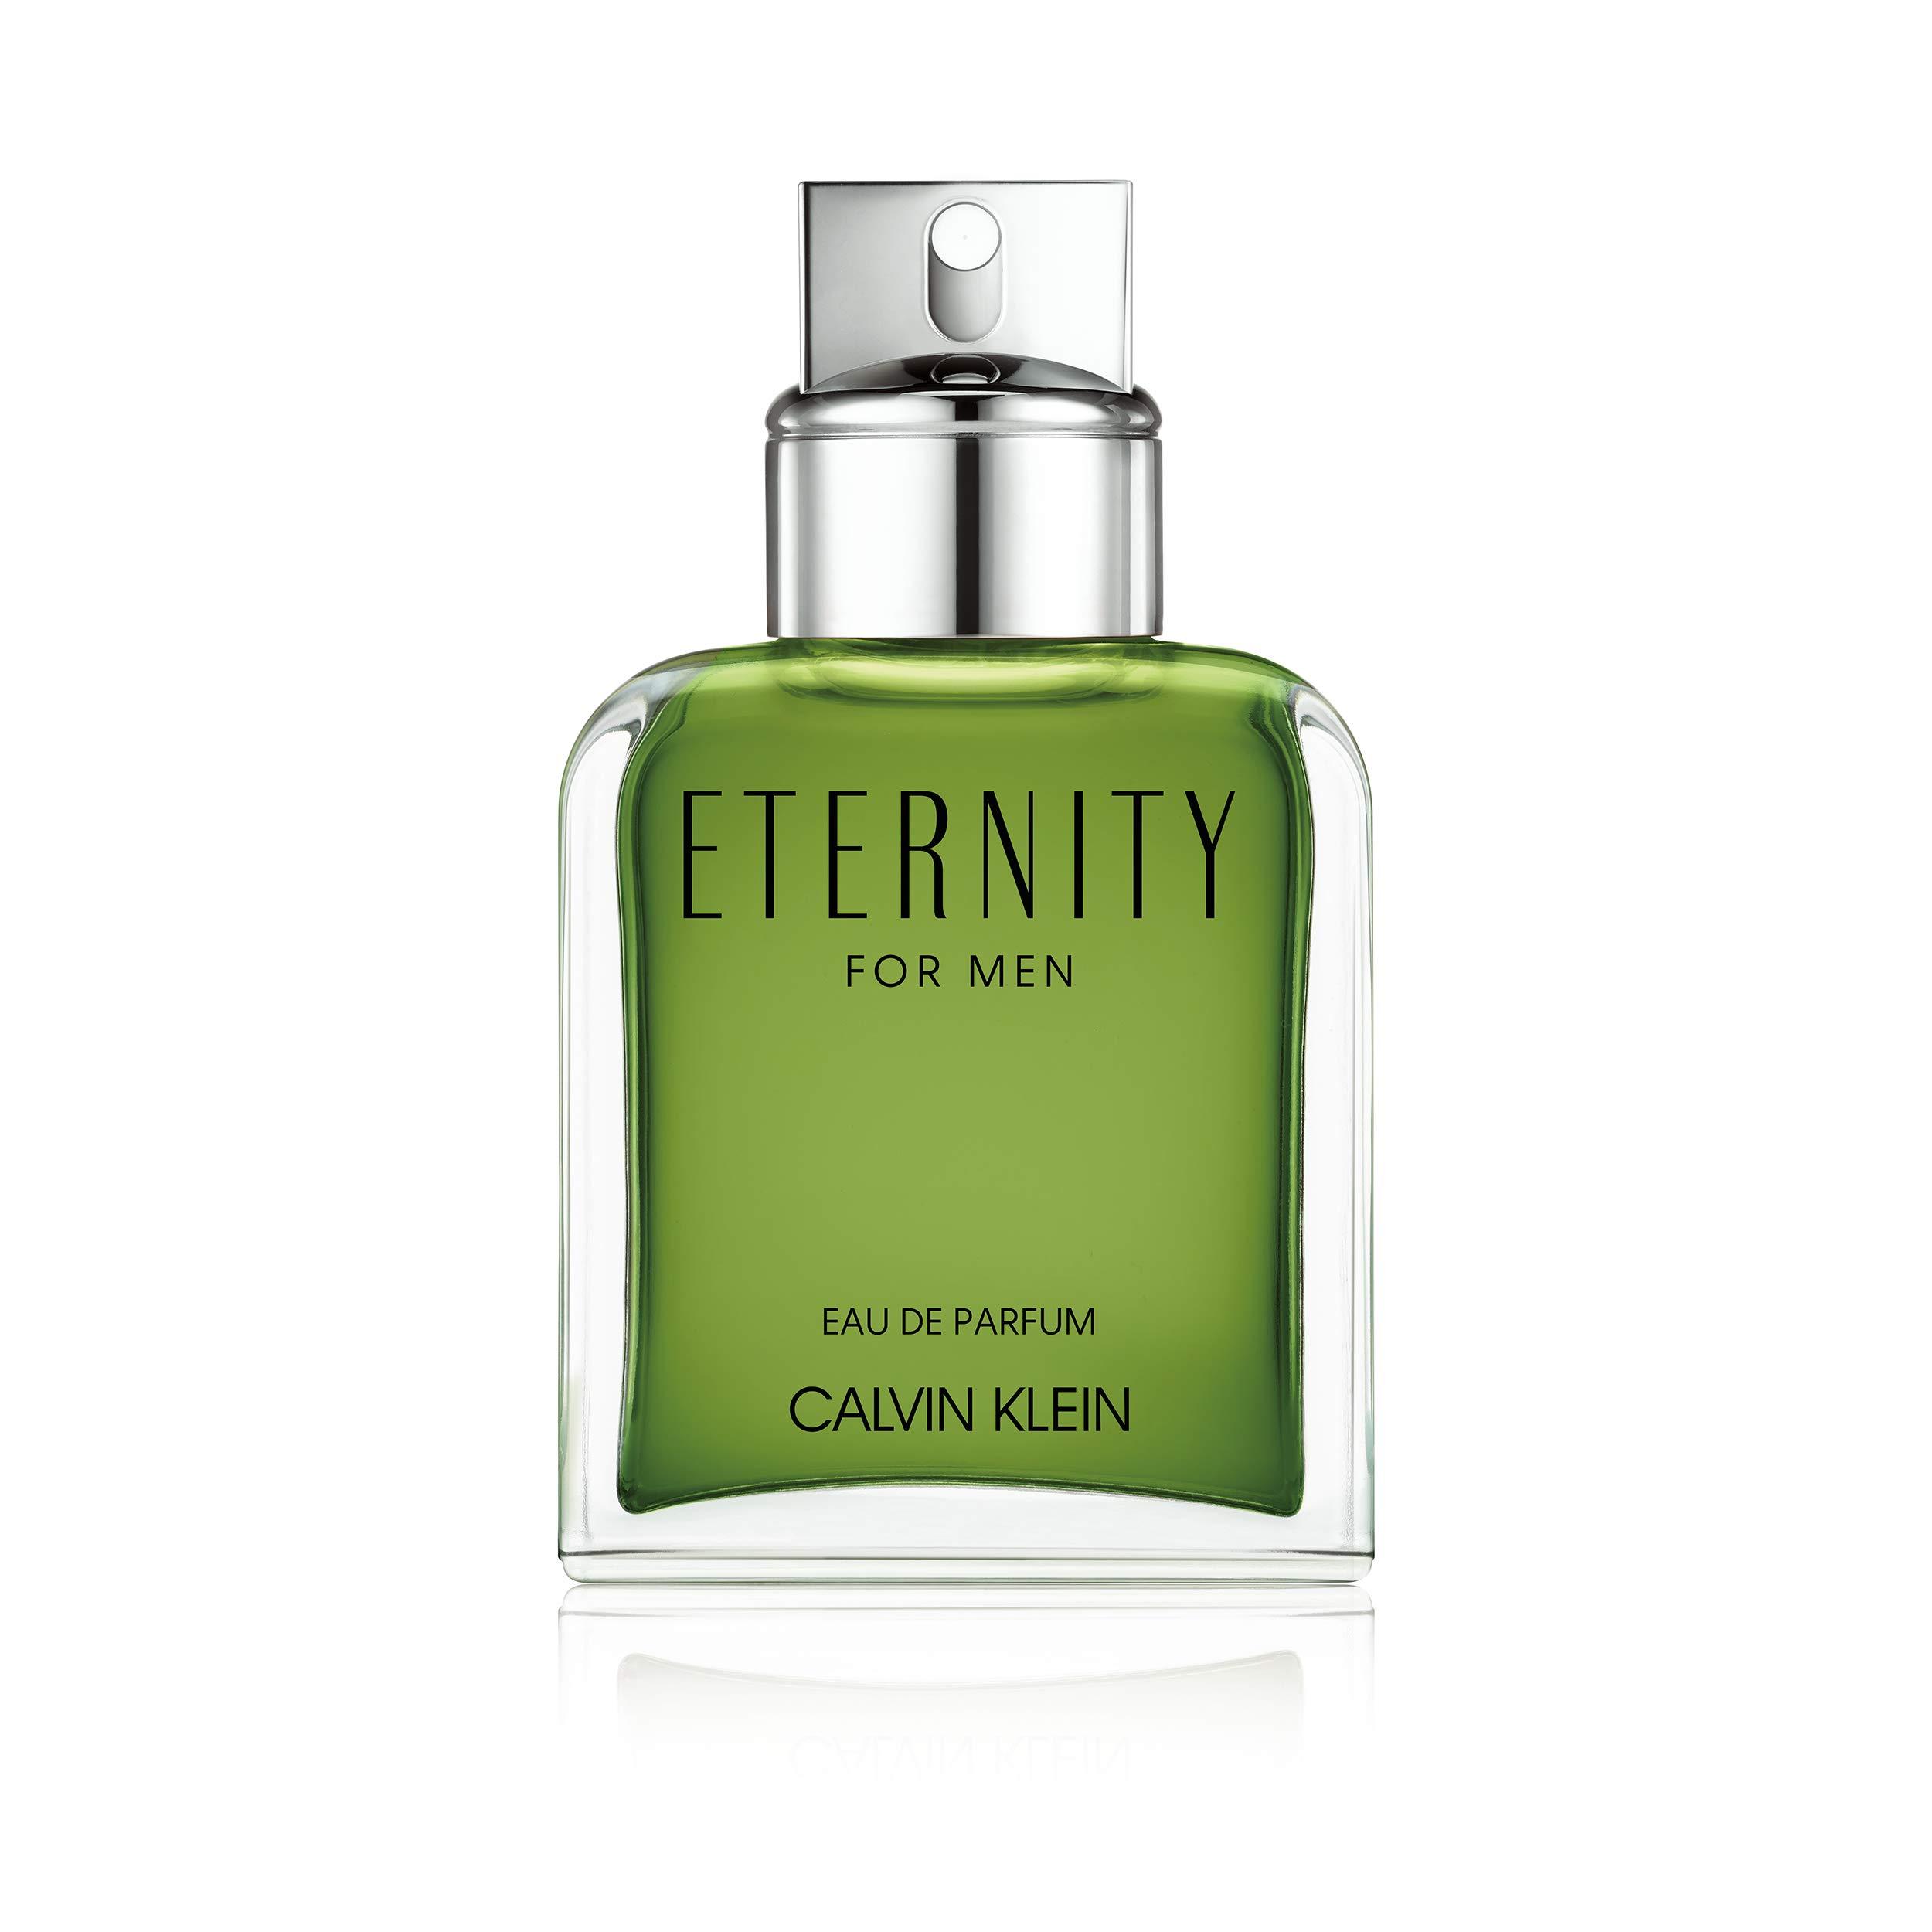 Calvin Klein Eternity for Men Eau de Parfum, 3.4 Fl Oz by Calvin Klein